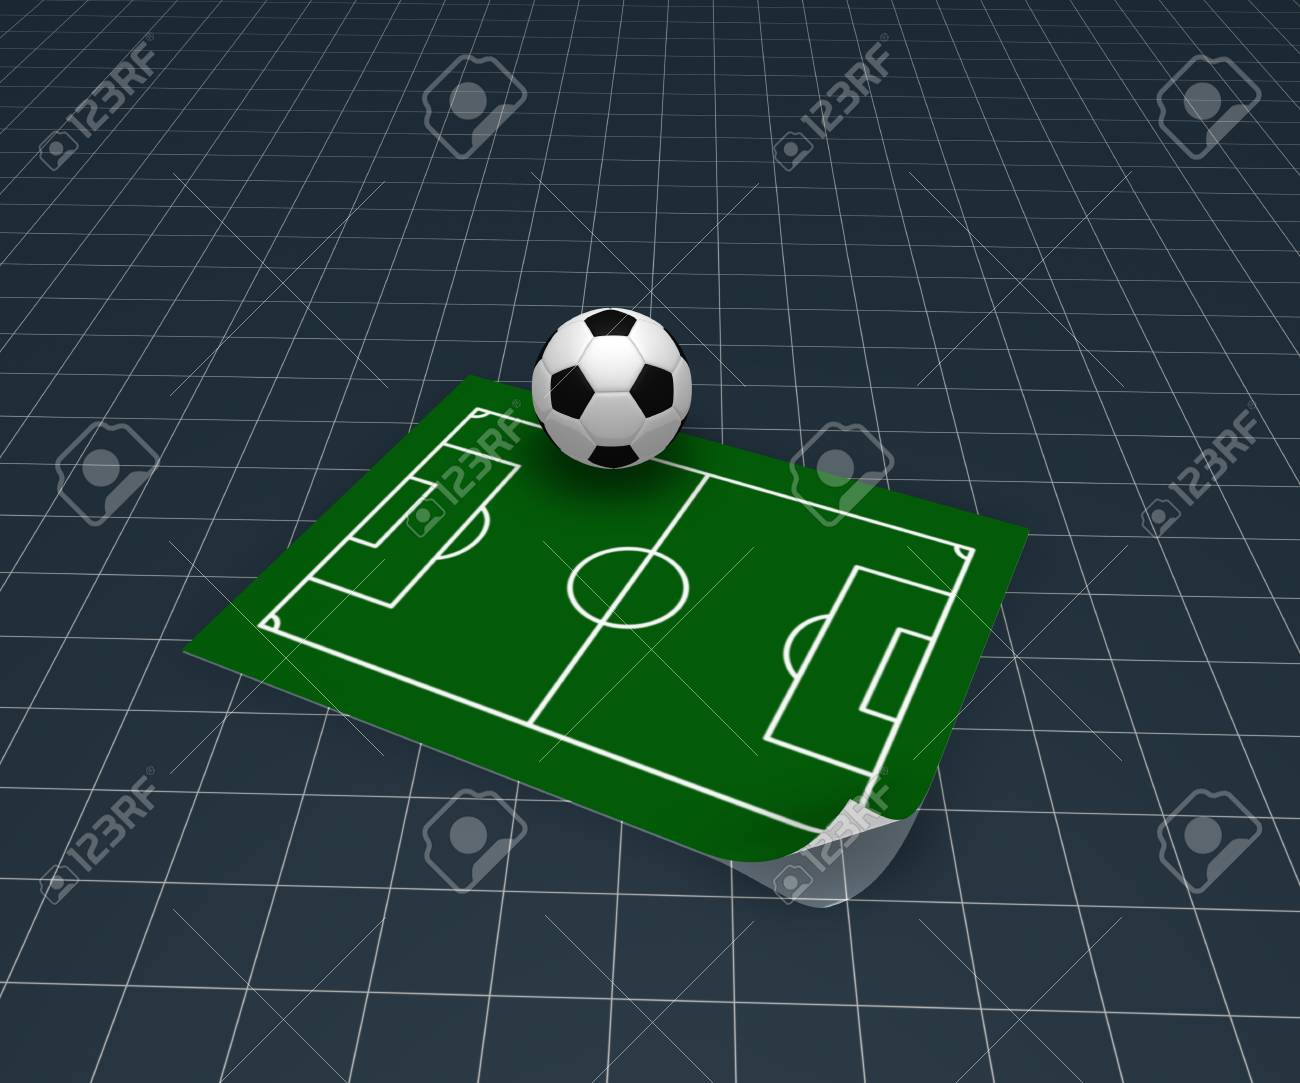 26467fef9 soccer ball and playground plan - 3d illustration Stock Illustration -  18378816